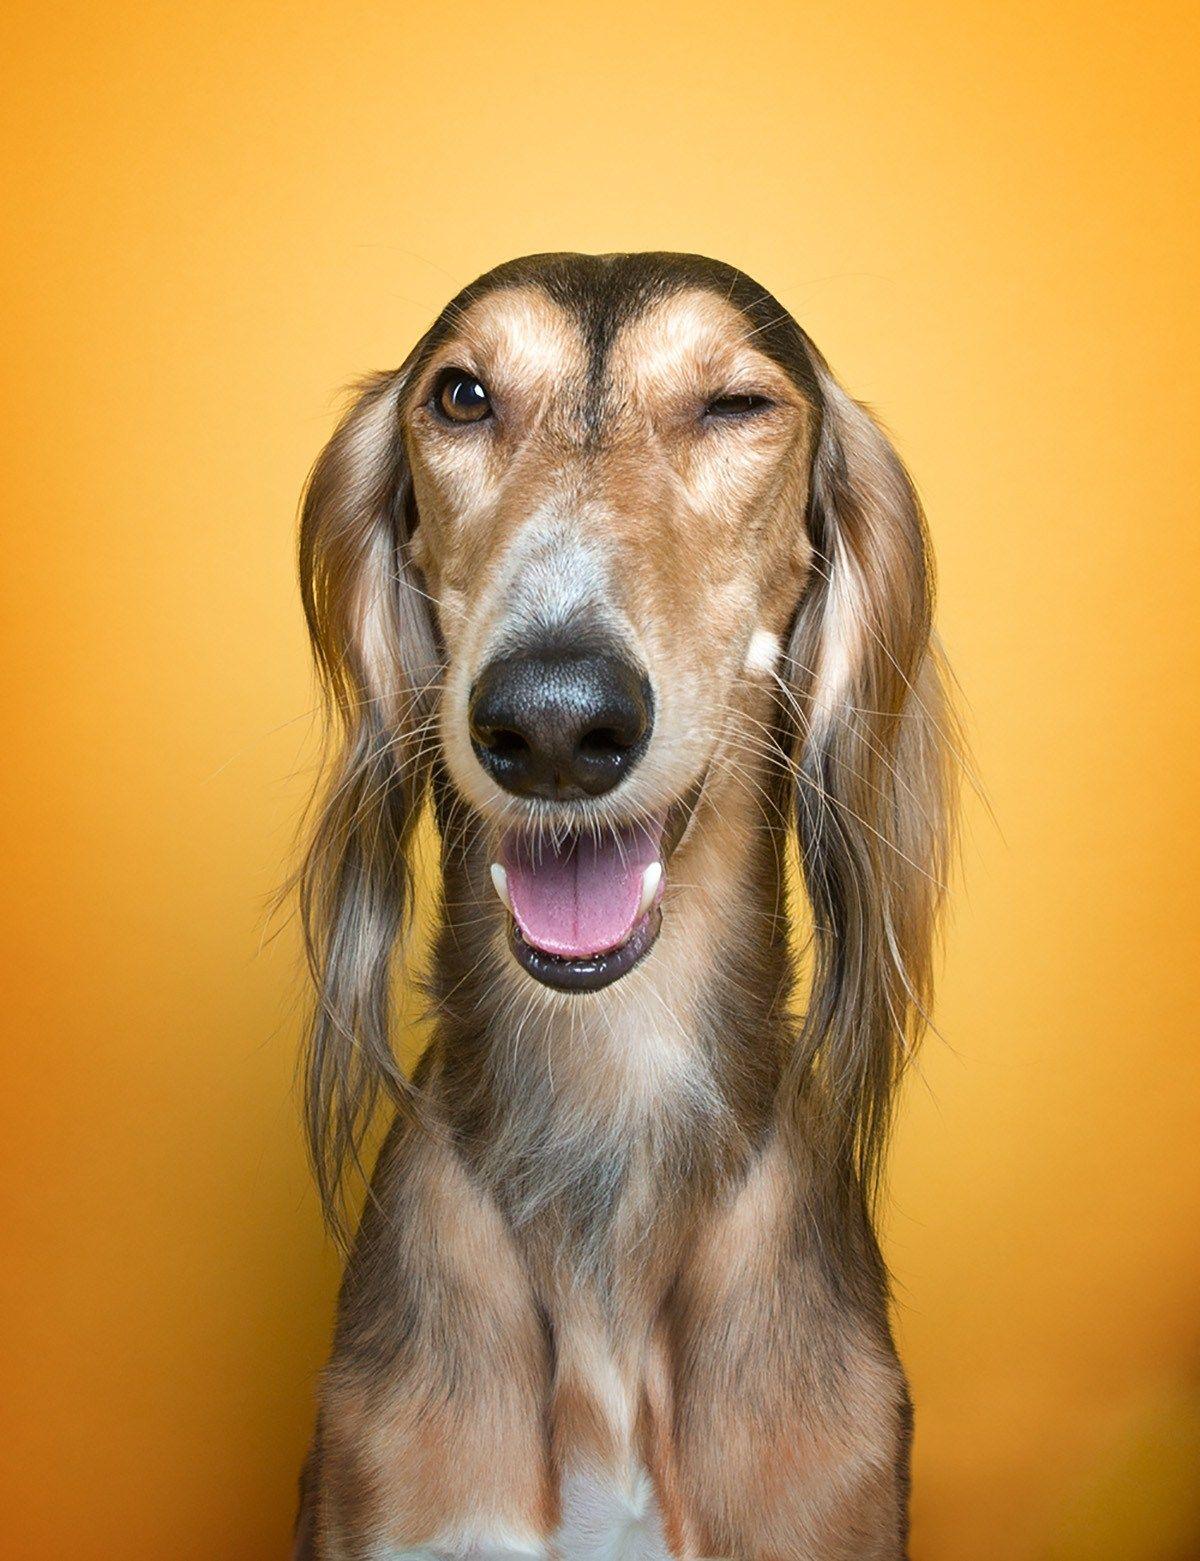 На.8, эмоции собаки в картинках